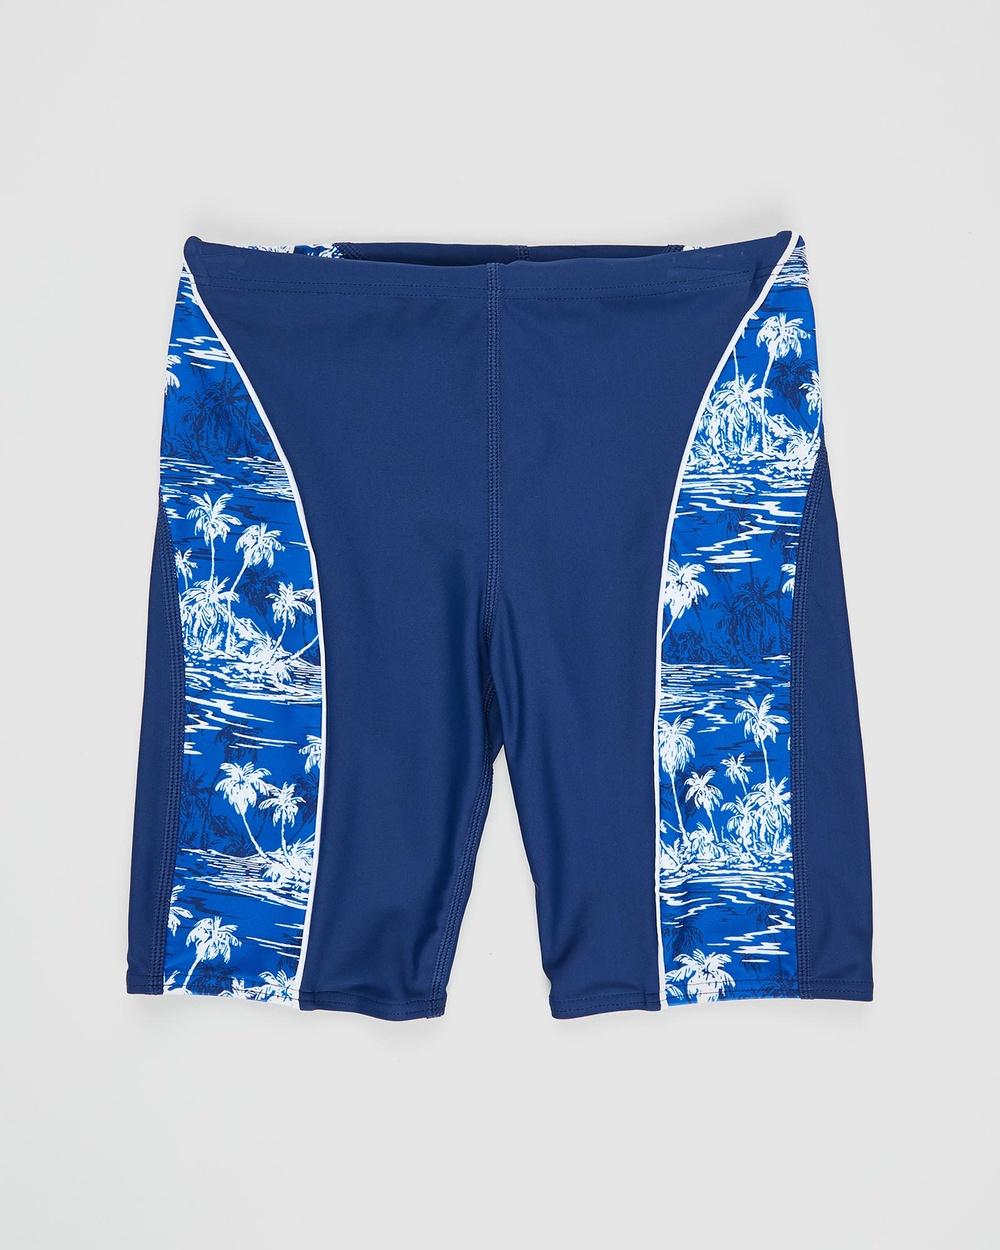 Bluesalt Beachwear Hawaiian Palms Swim Jammer Pants Teens Swimwear Navy Blue